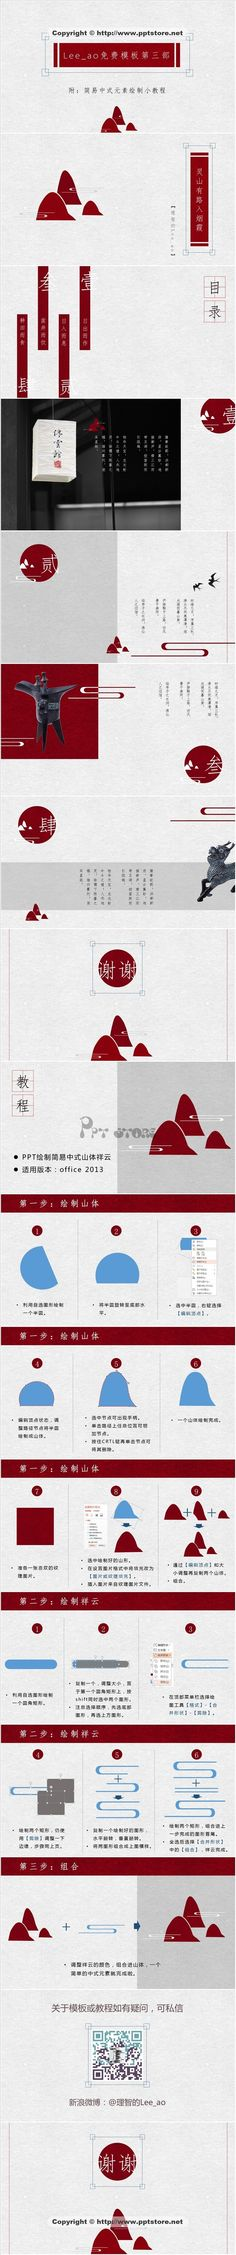 download:http://www.pptstore.net/wenhuayishu_ppt/12705.html